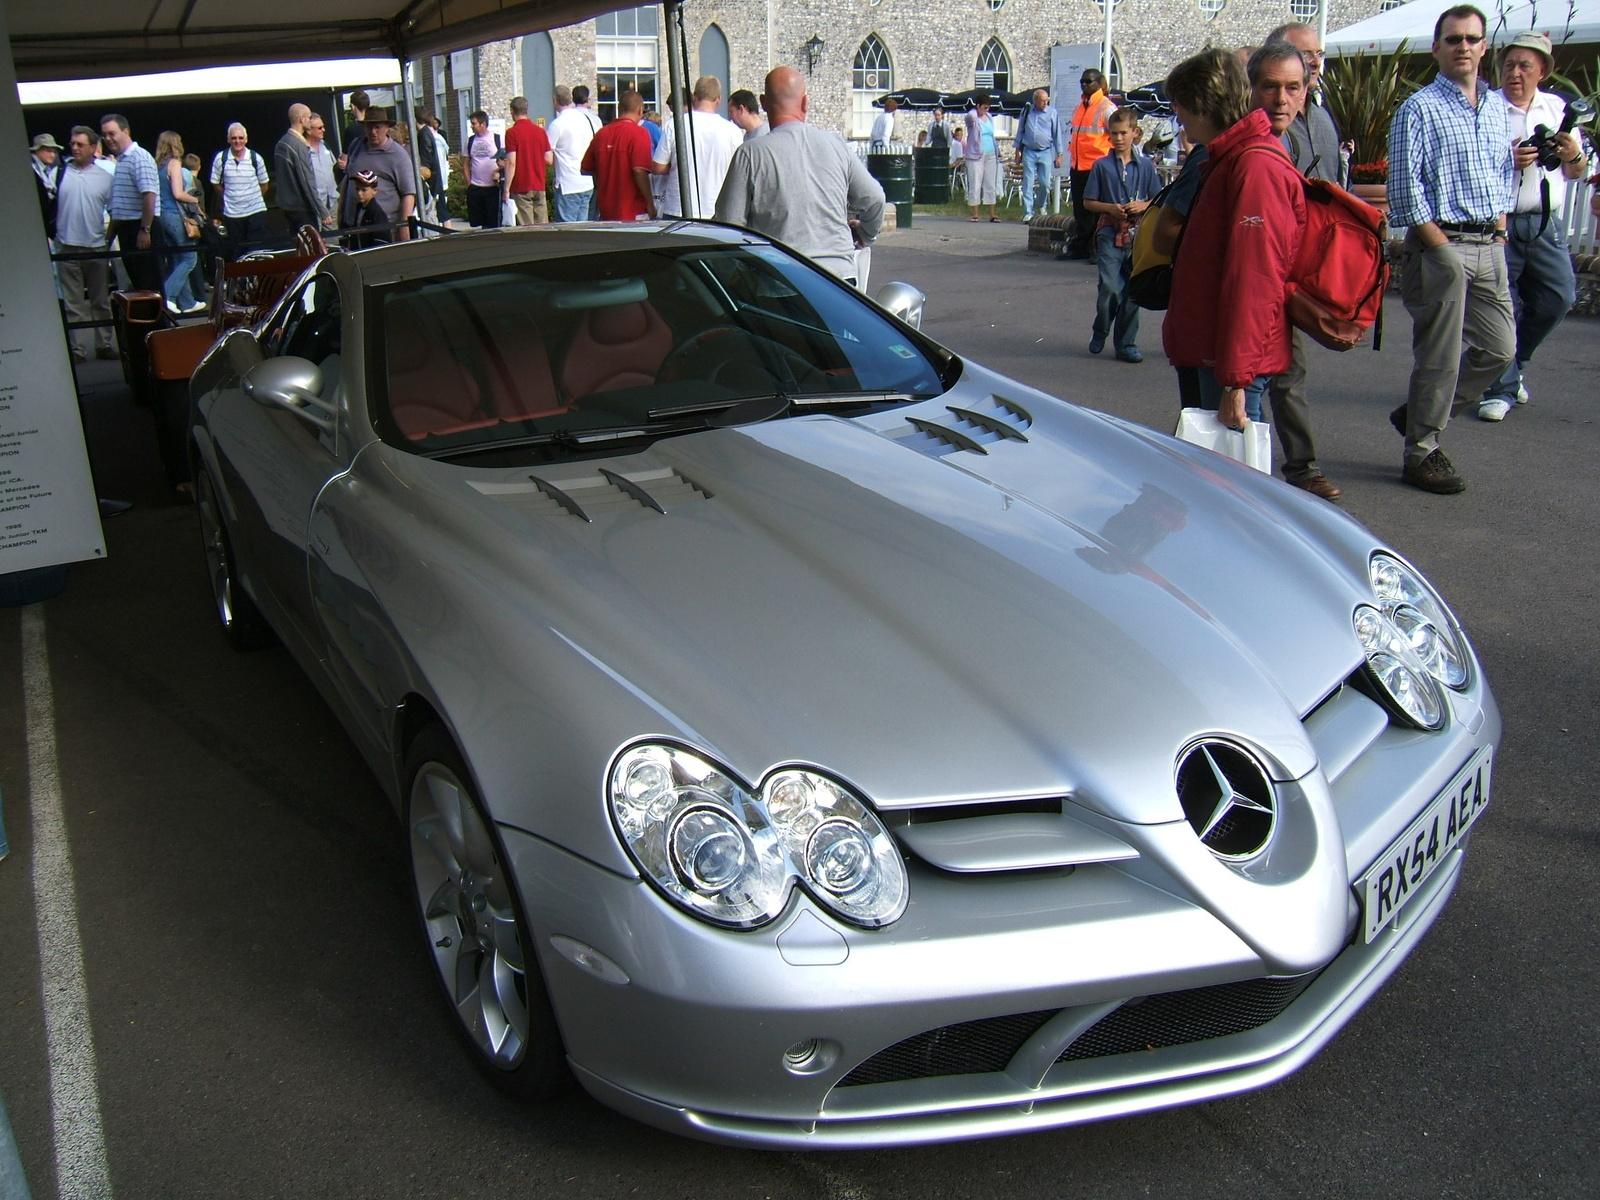 Mercedes Benz Slr Mclaren Questions Whtas The Actual